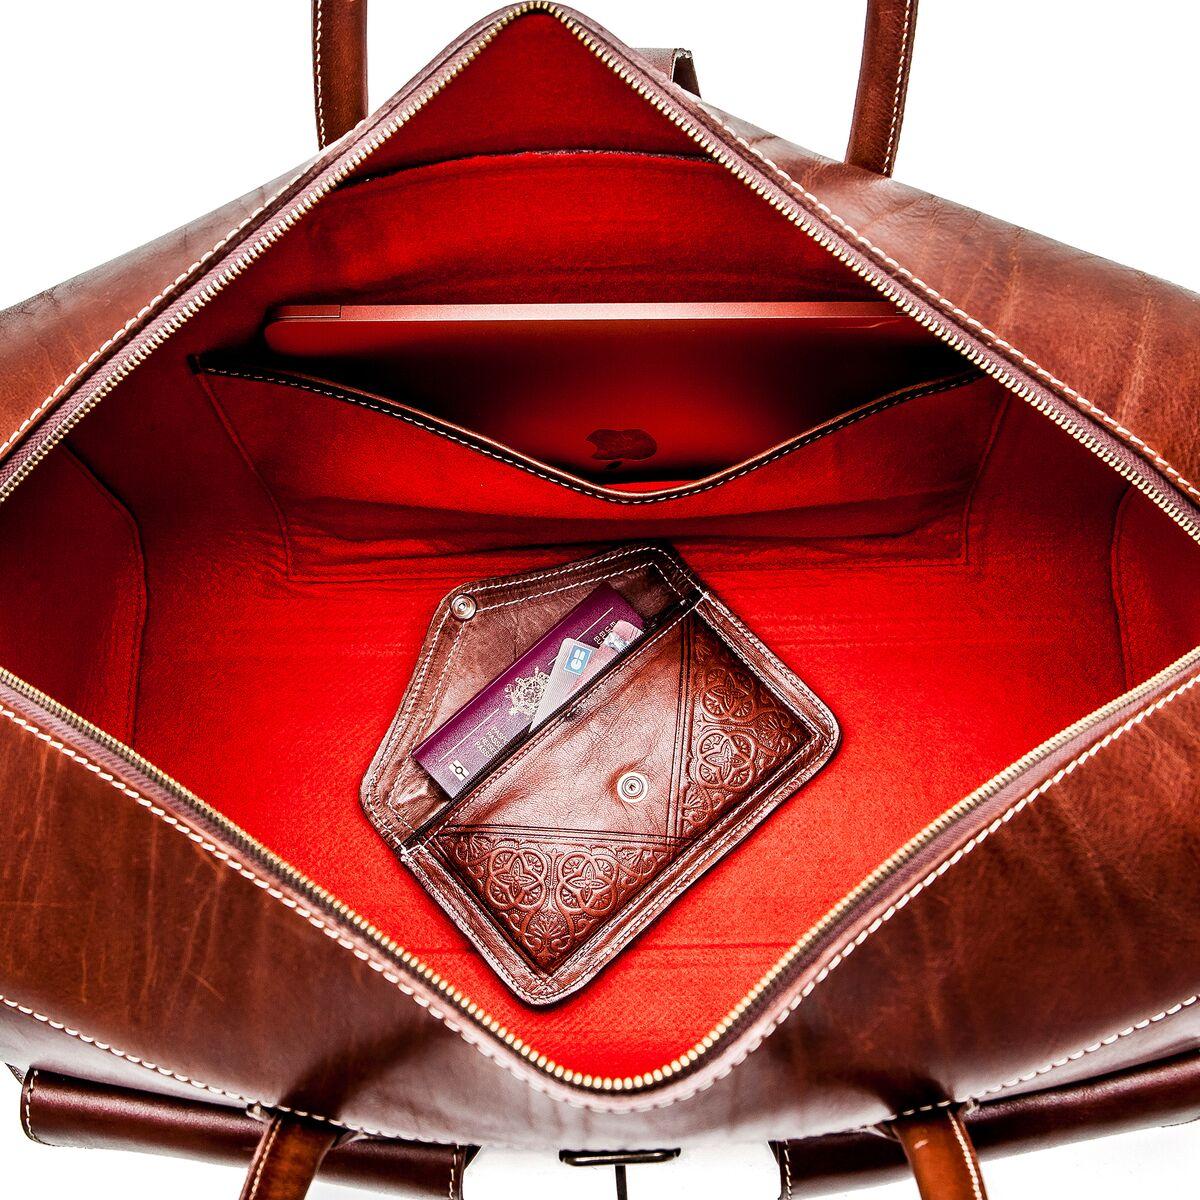 prendre soin de son sac en cuir